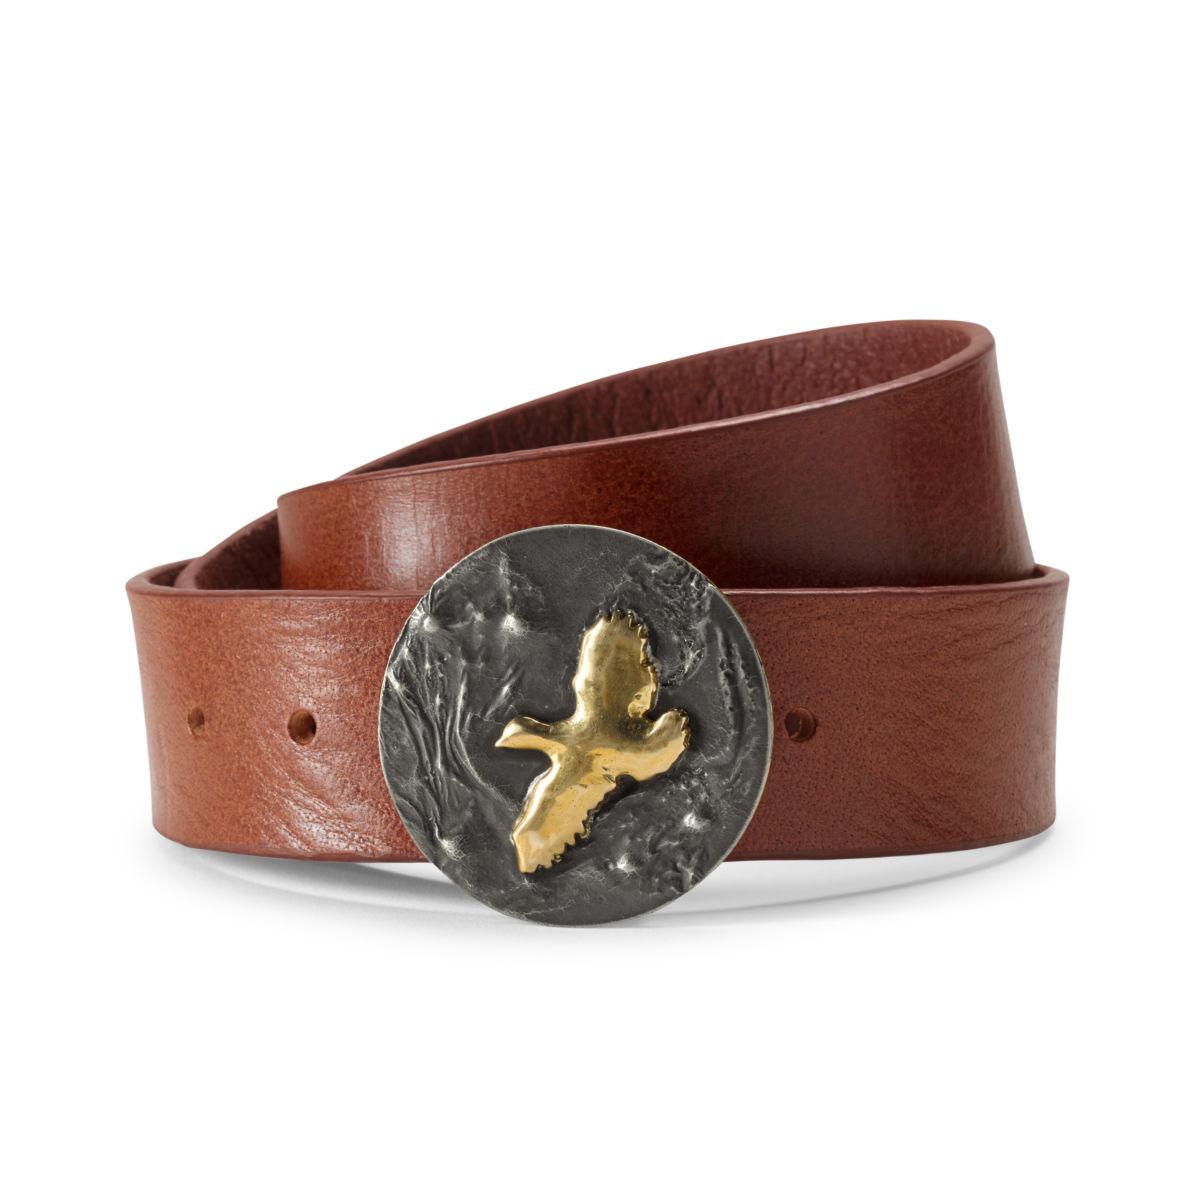 Handmade Artisan Sporting Belt - QUAILimage number 0